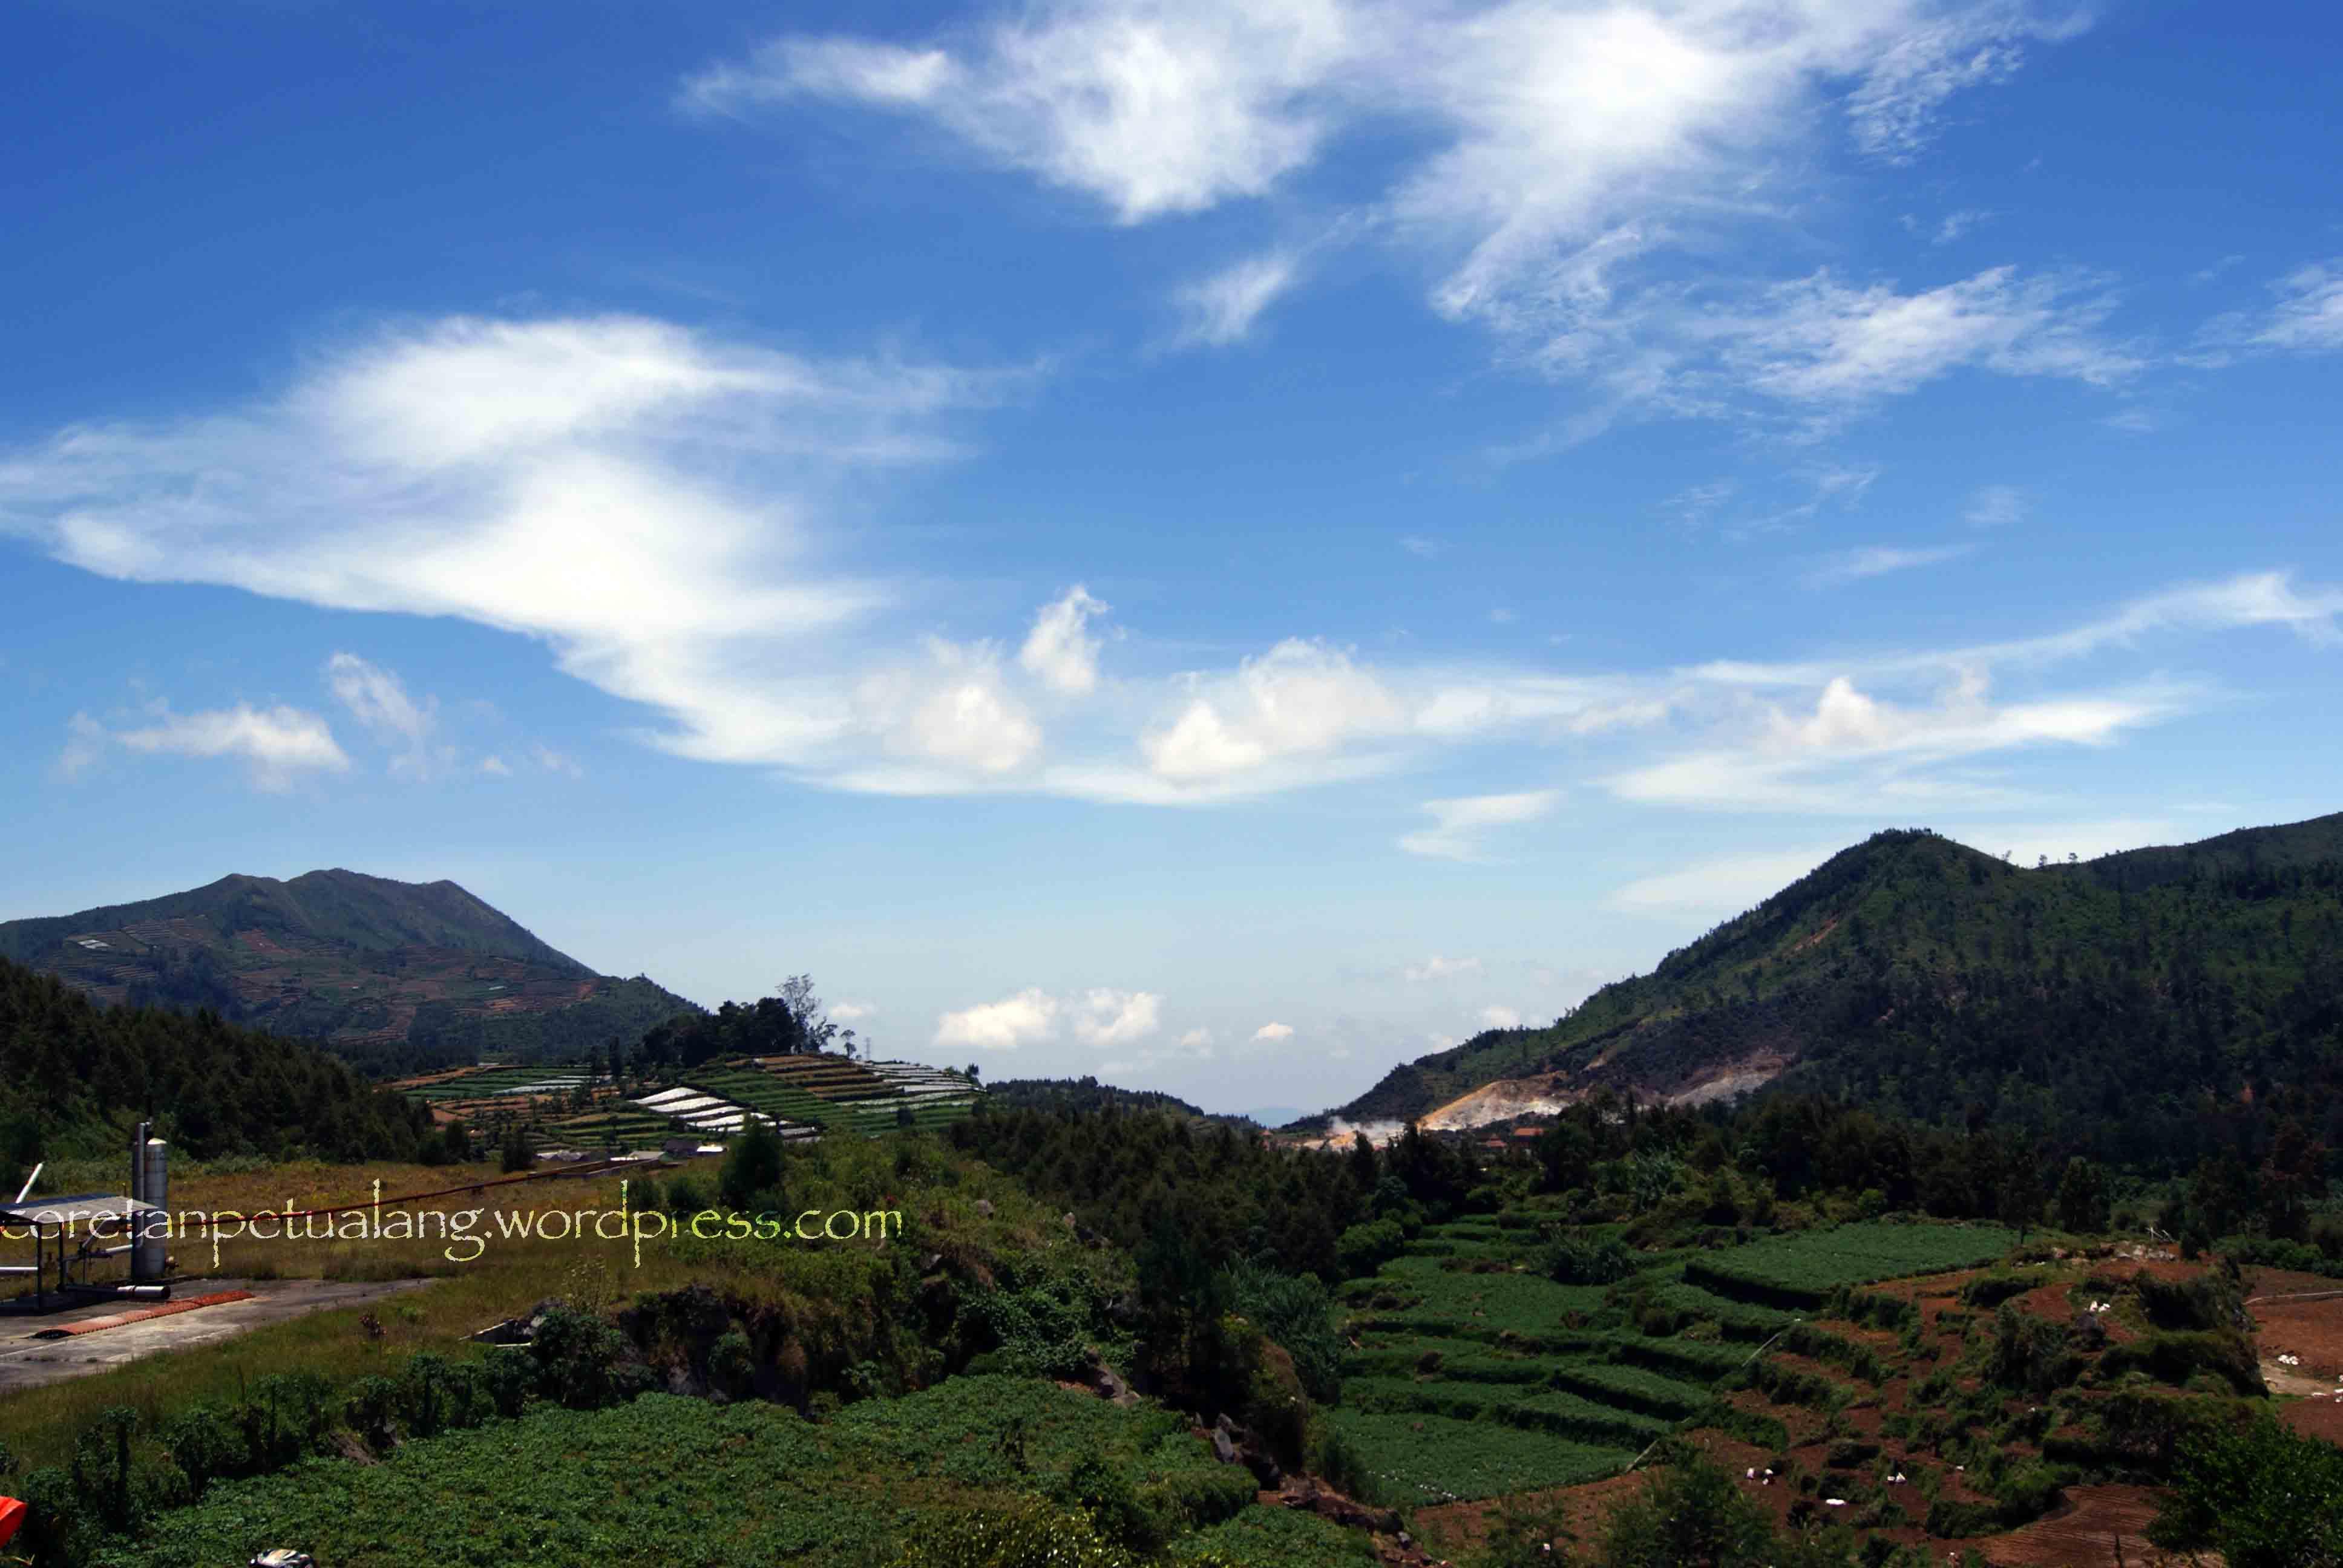 From Dieng Plateau With Love Season 1 Alam Dataran Tinggi Dieng